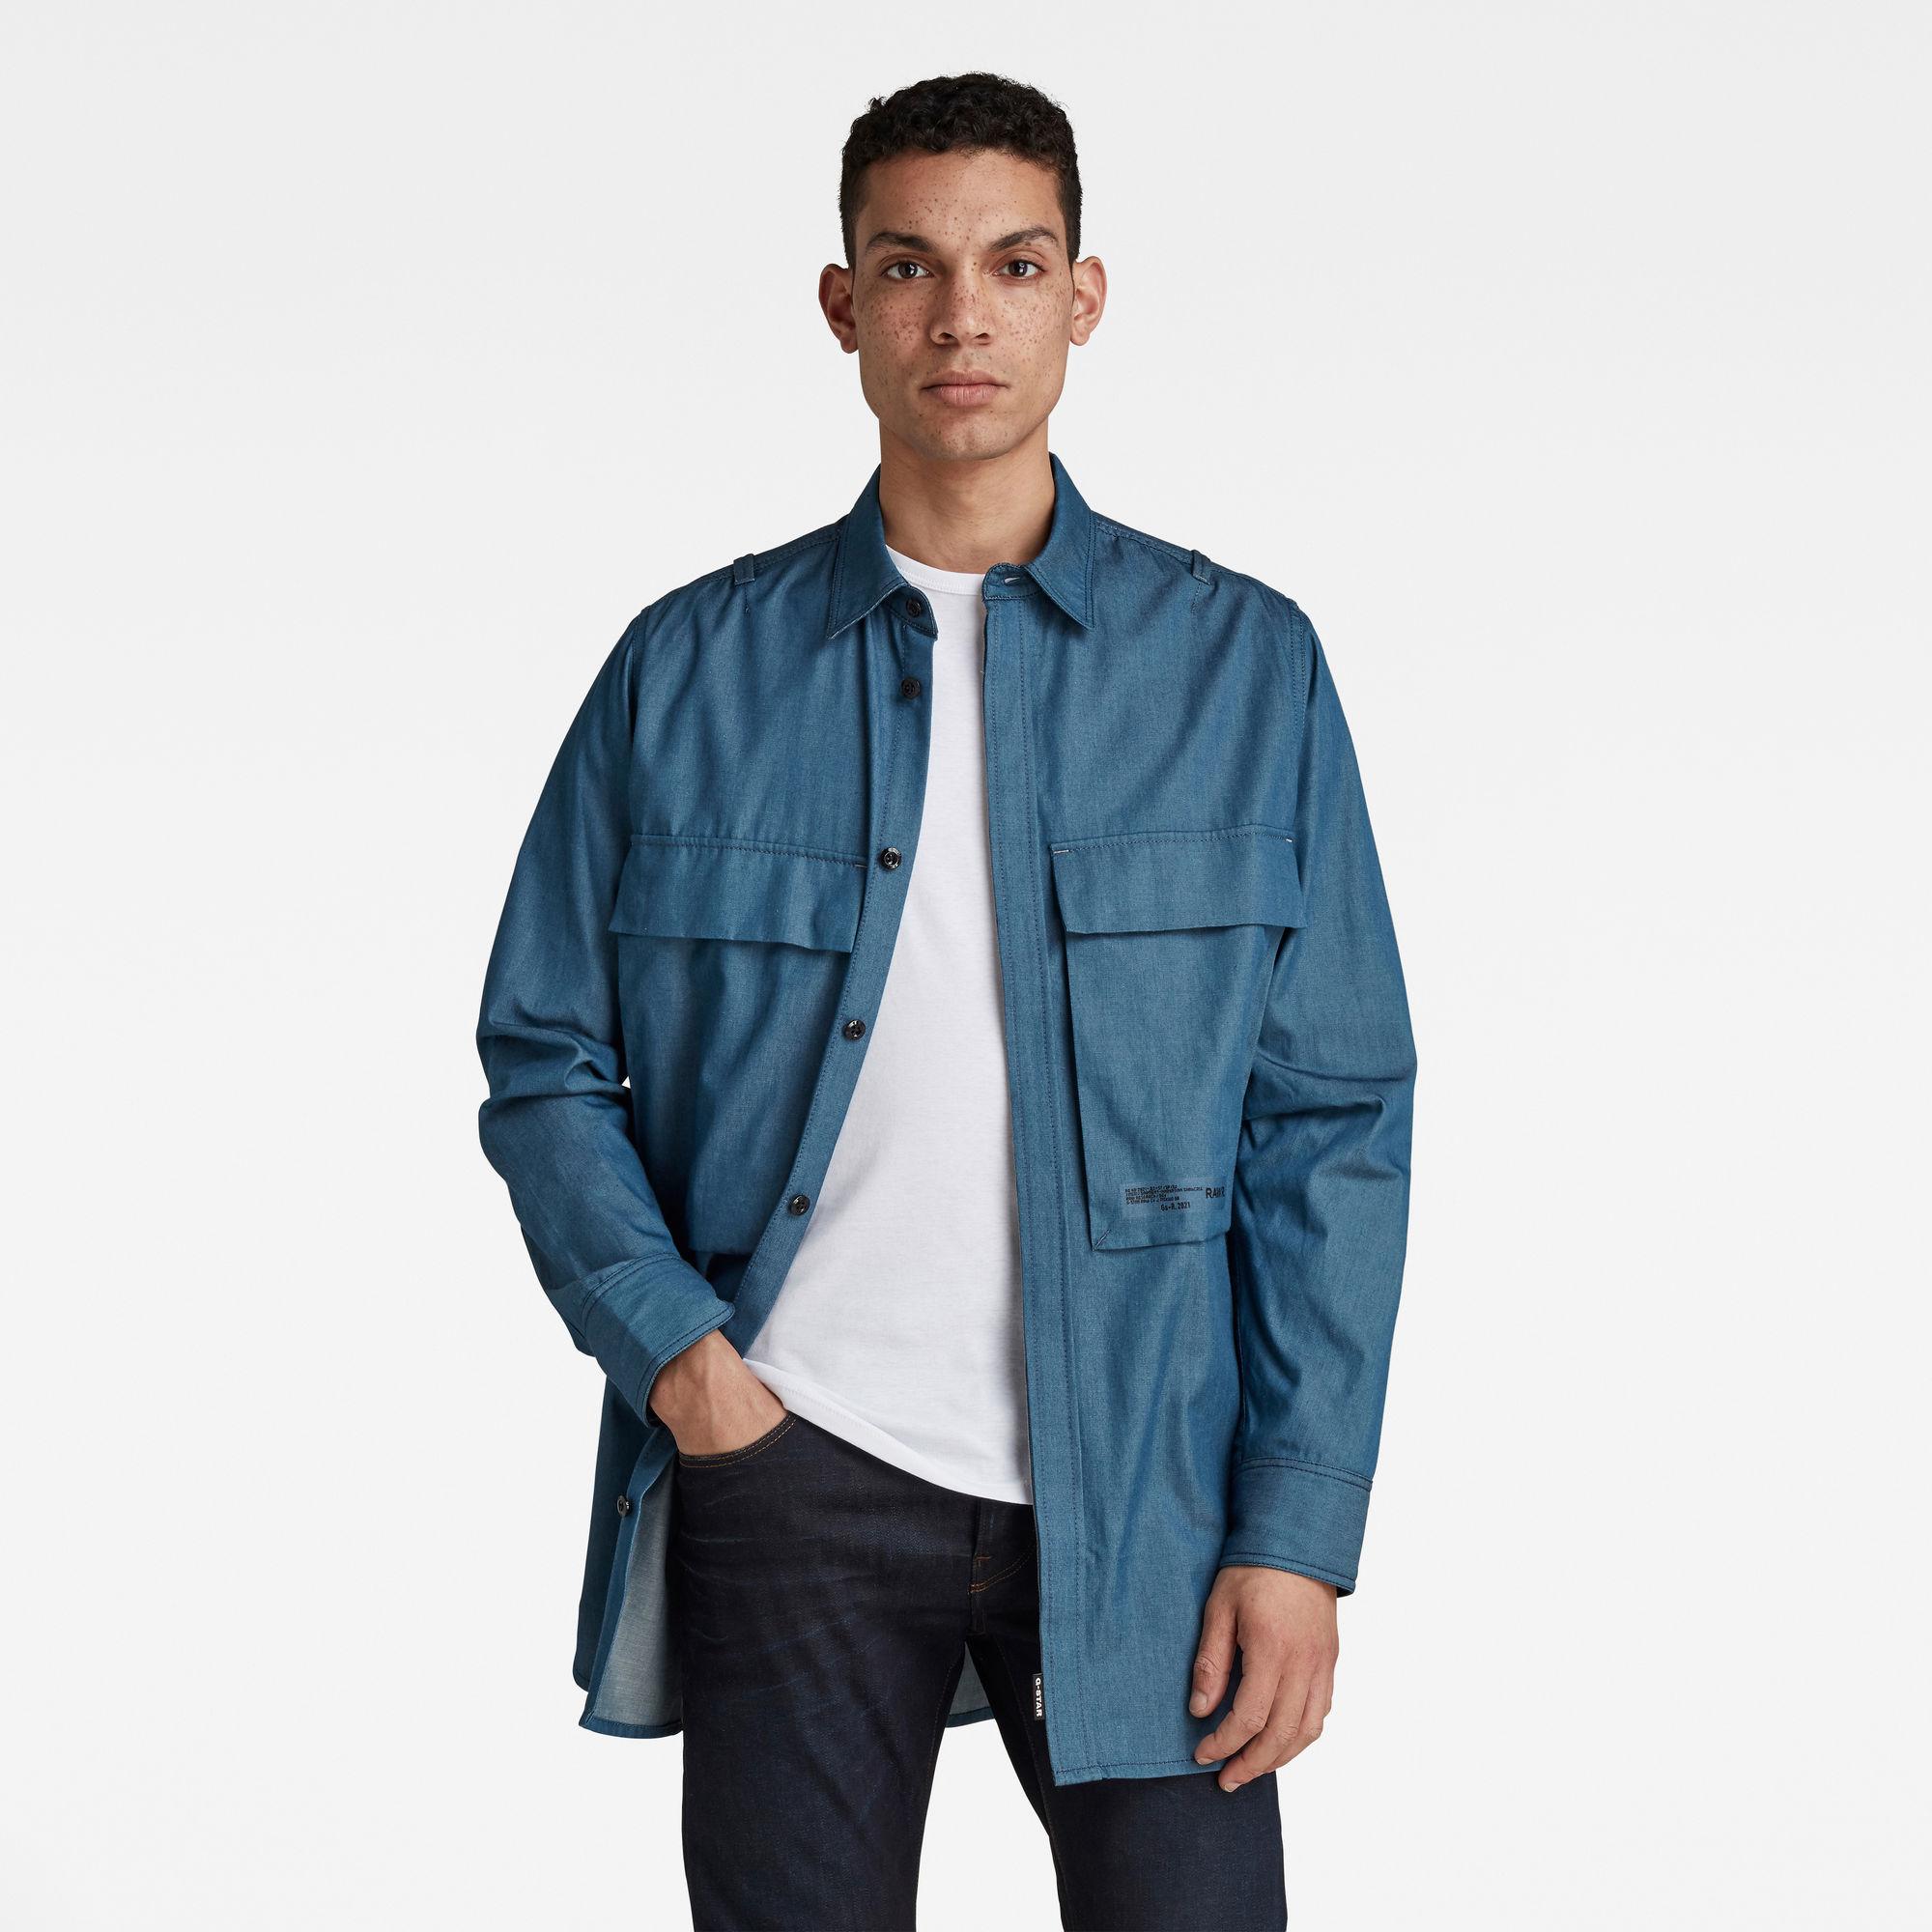 G-Star RAW Heren GSRR Regular Long Shirt Donkerblauw